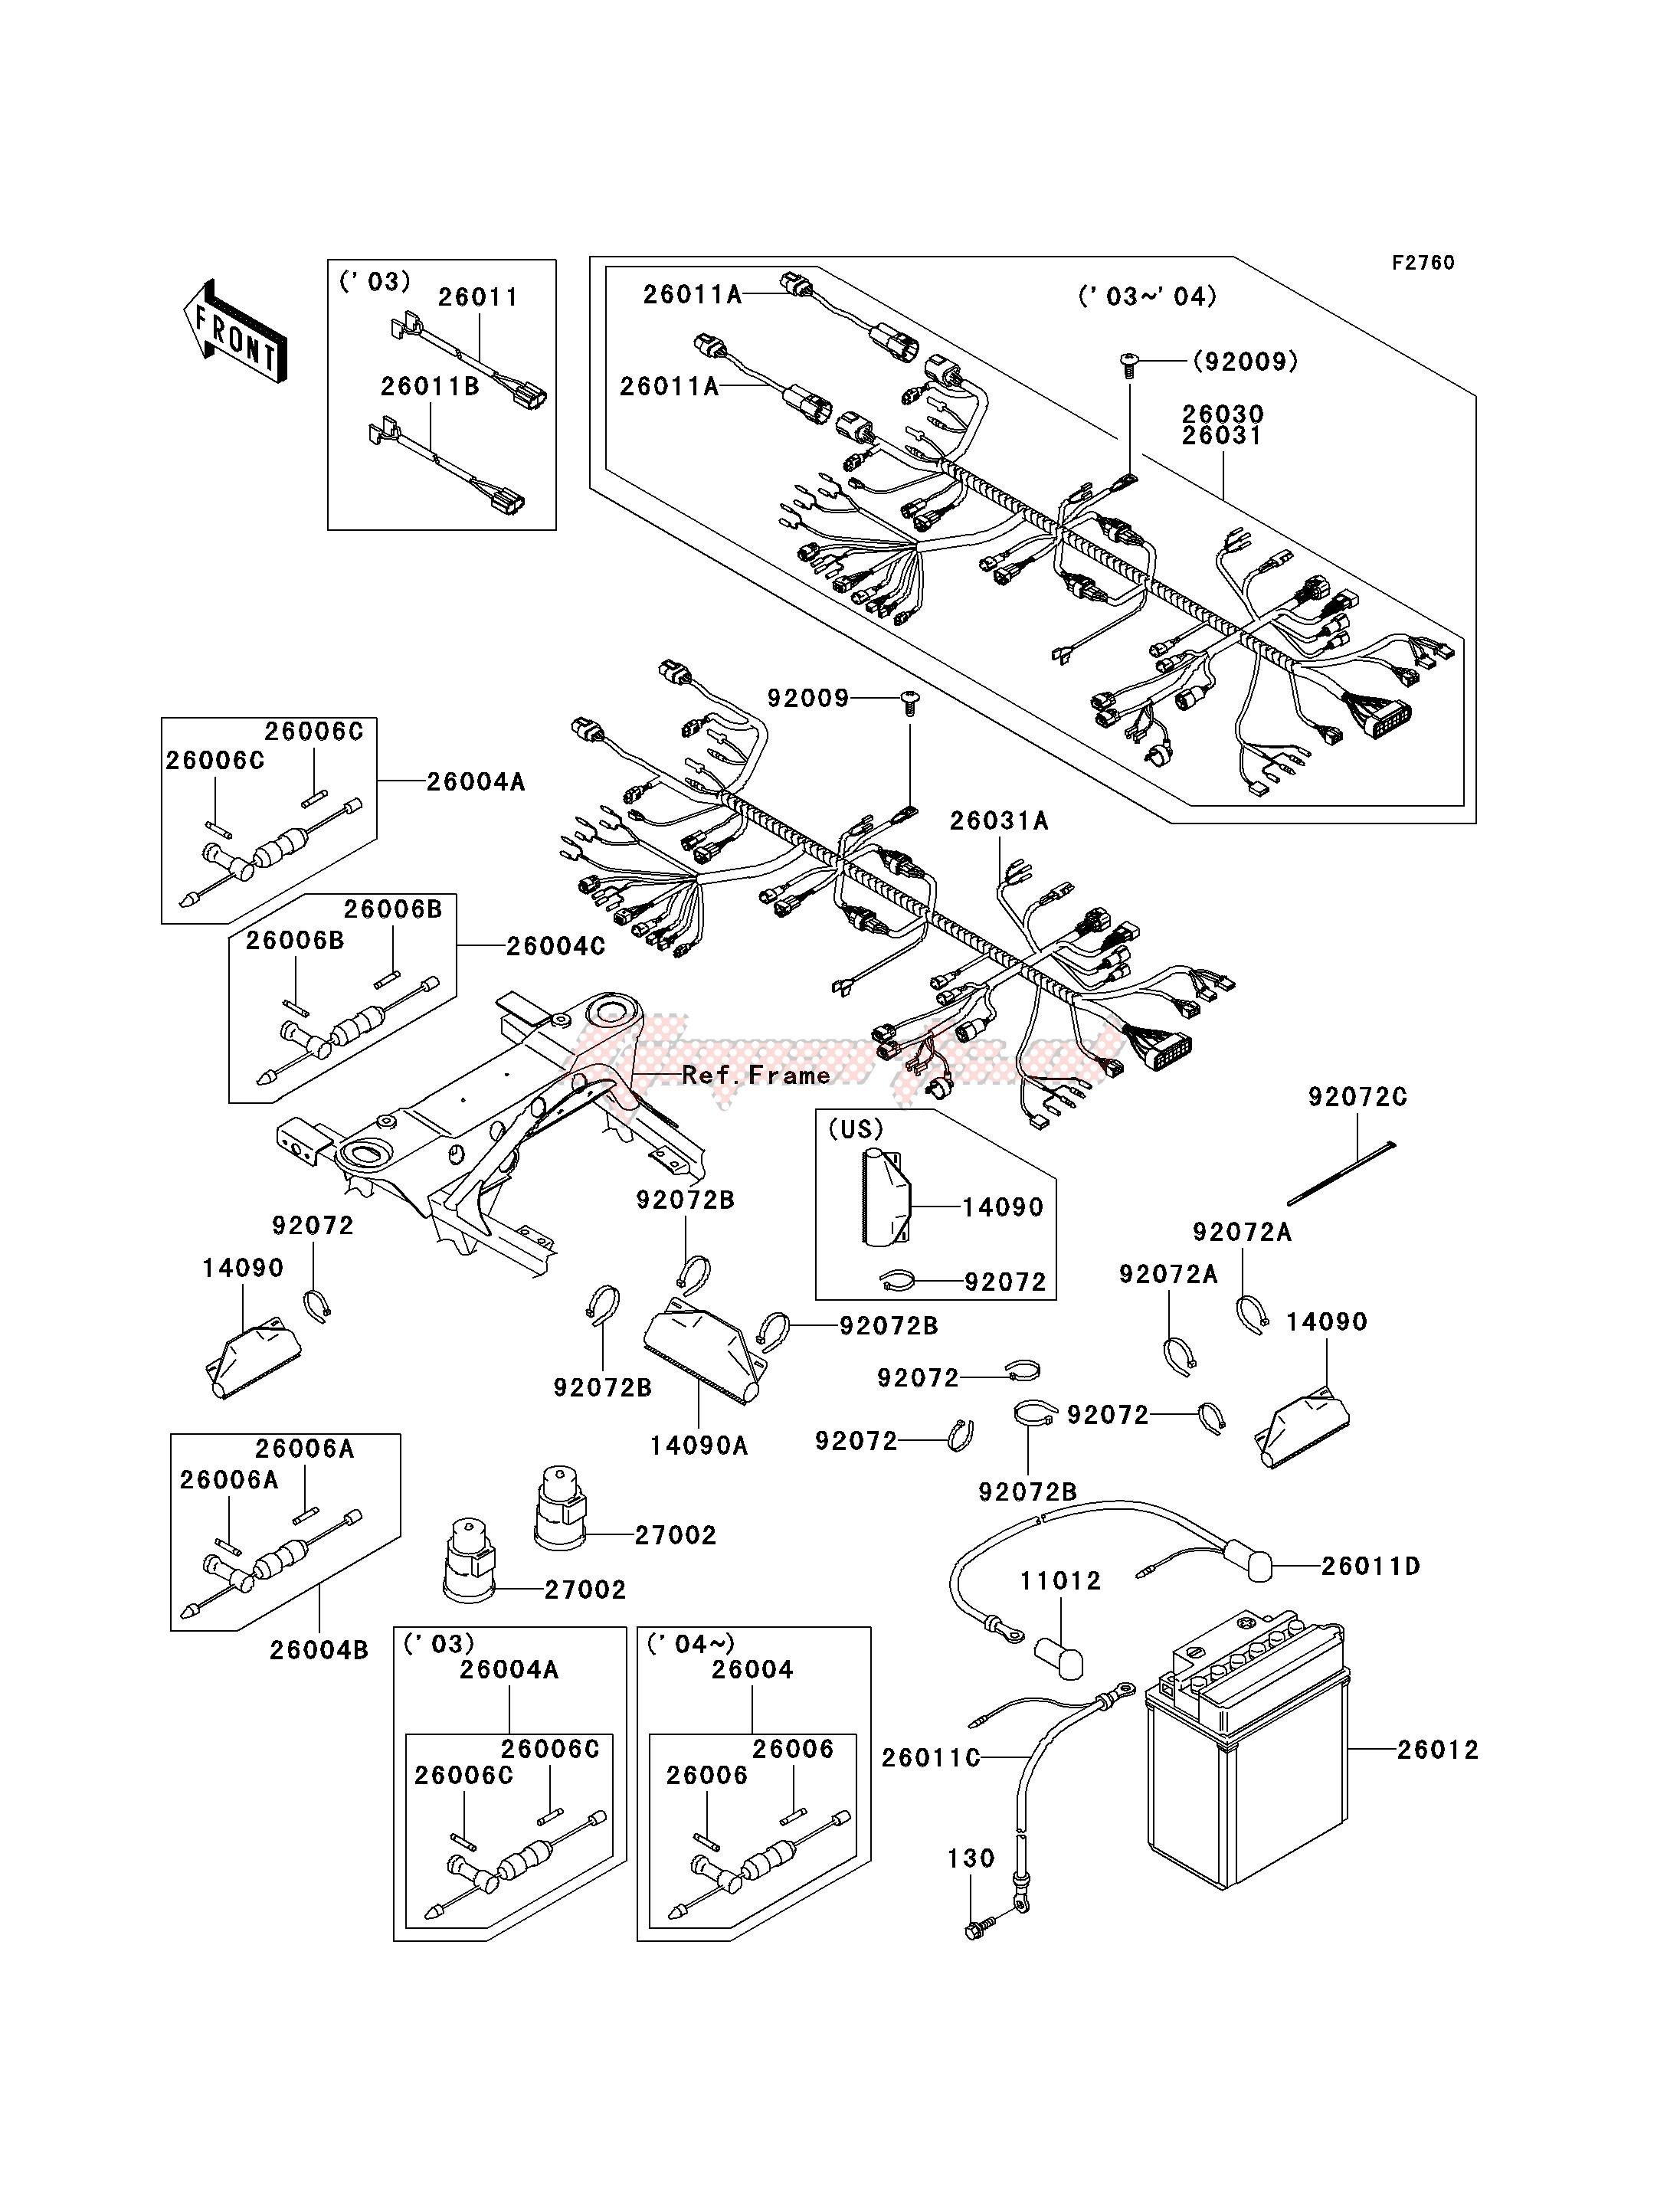 Kawasaki Prairie 360 Fuse Box - Wiring Diagram Replace list-pocket -  list-pocket.miramontiseo.it | 2003 Kawasaki 360 Engine Diagram |  | list-pocket.miramontiseo.it